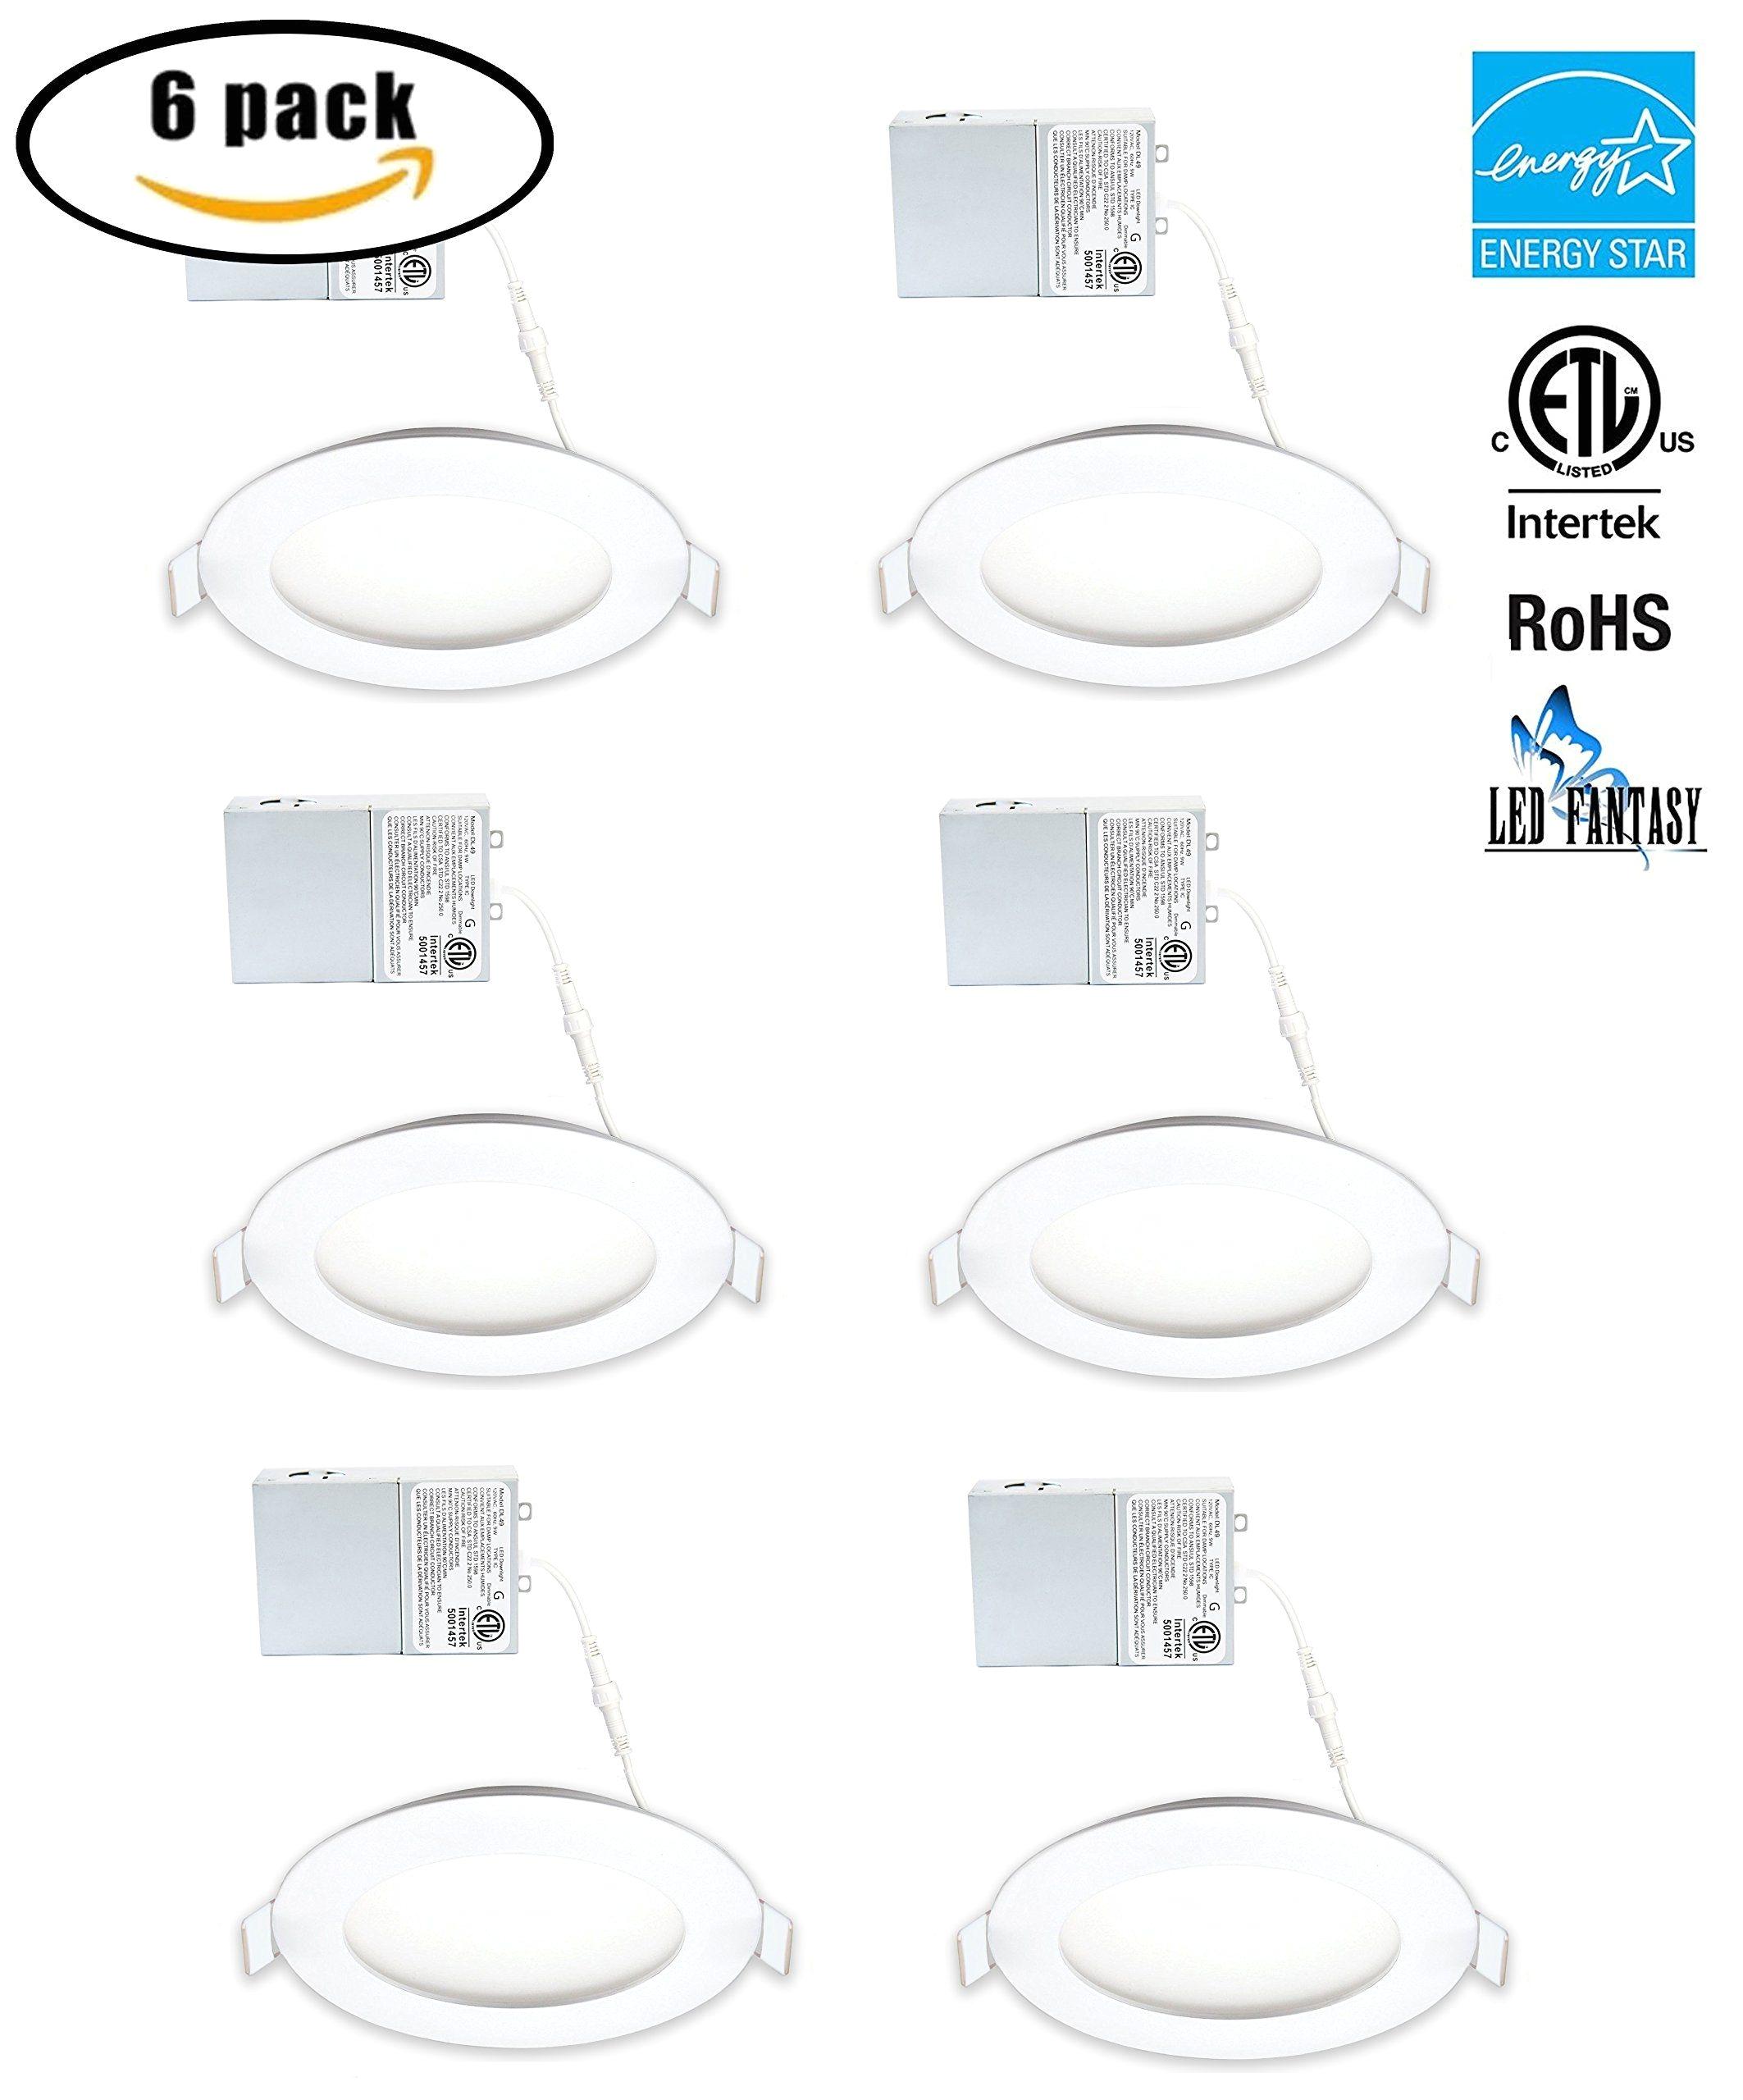 led fantasy 4 inch 9w 120v recessed ultra thin ceiling led light retrofit panel slim